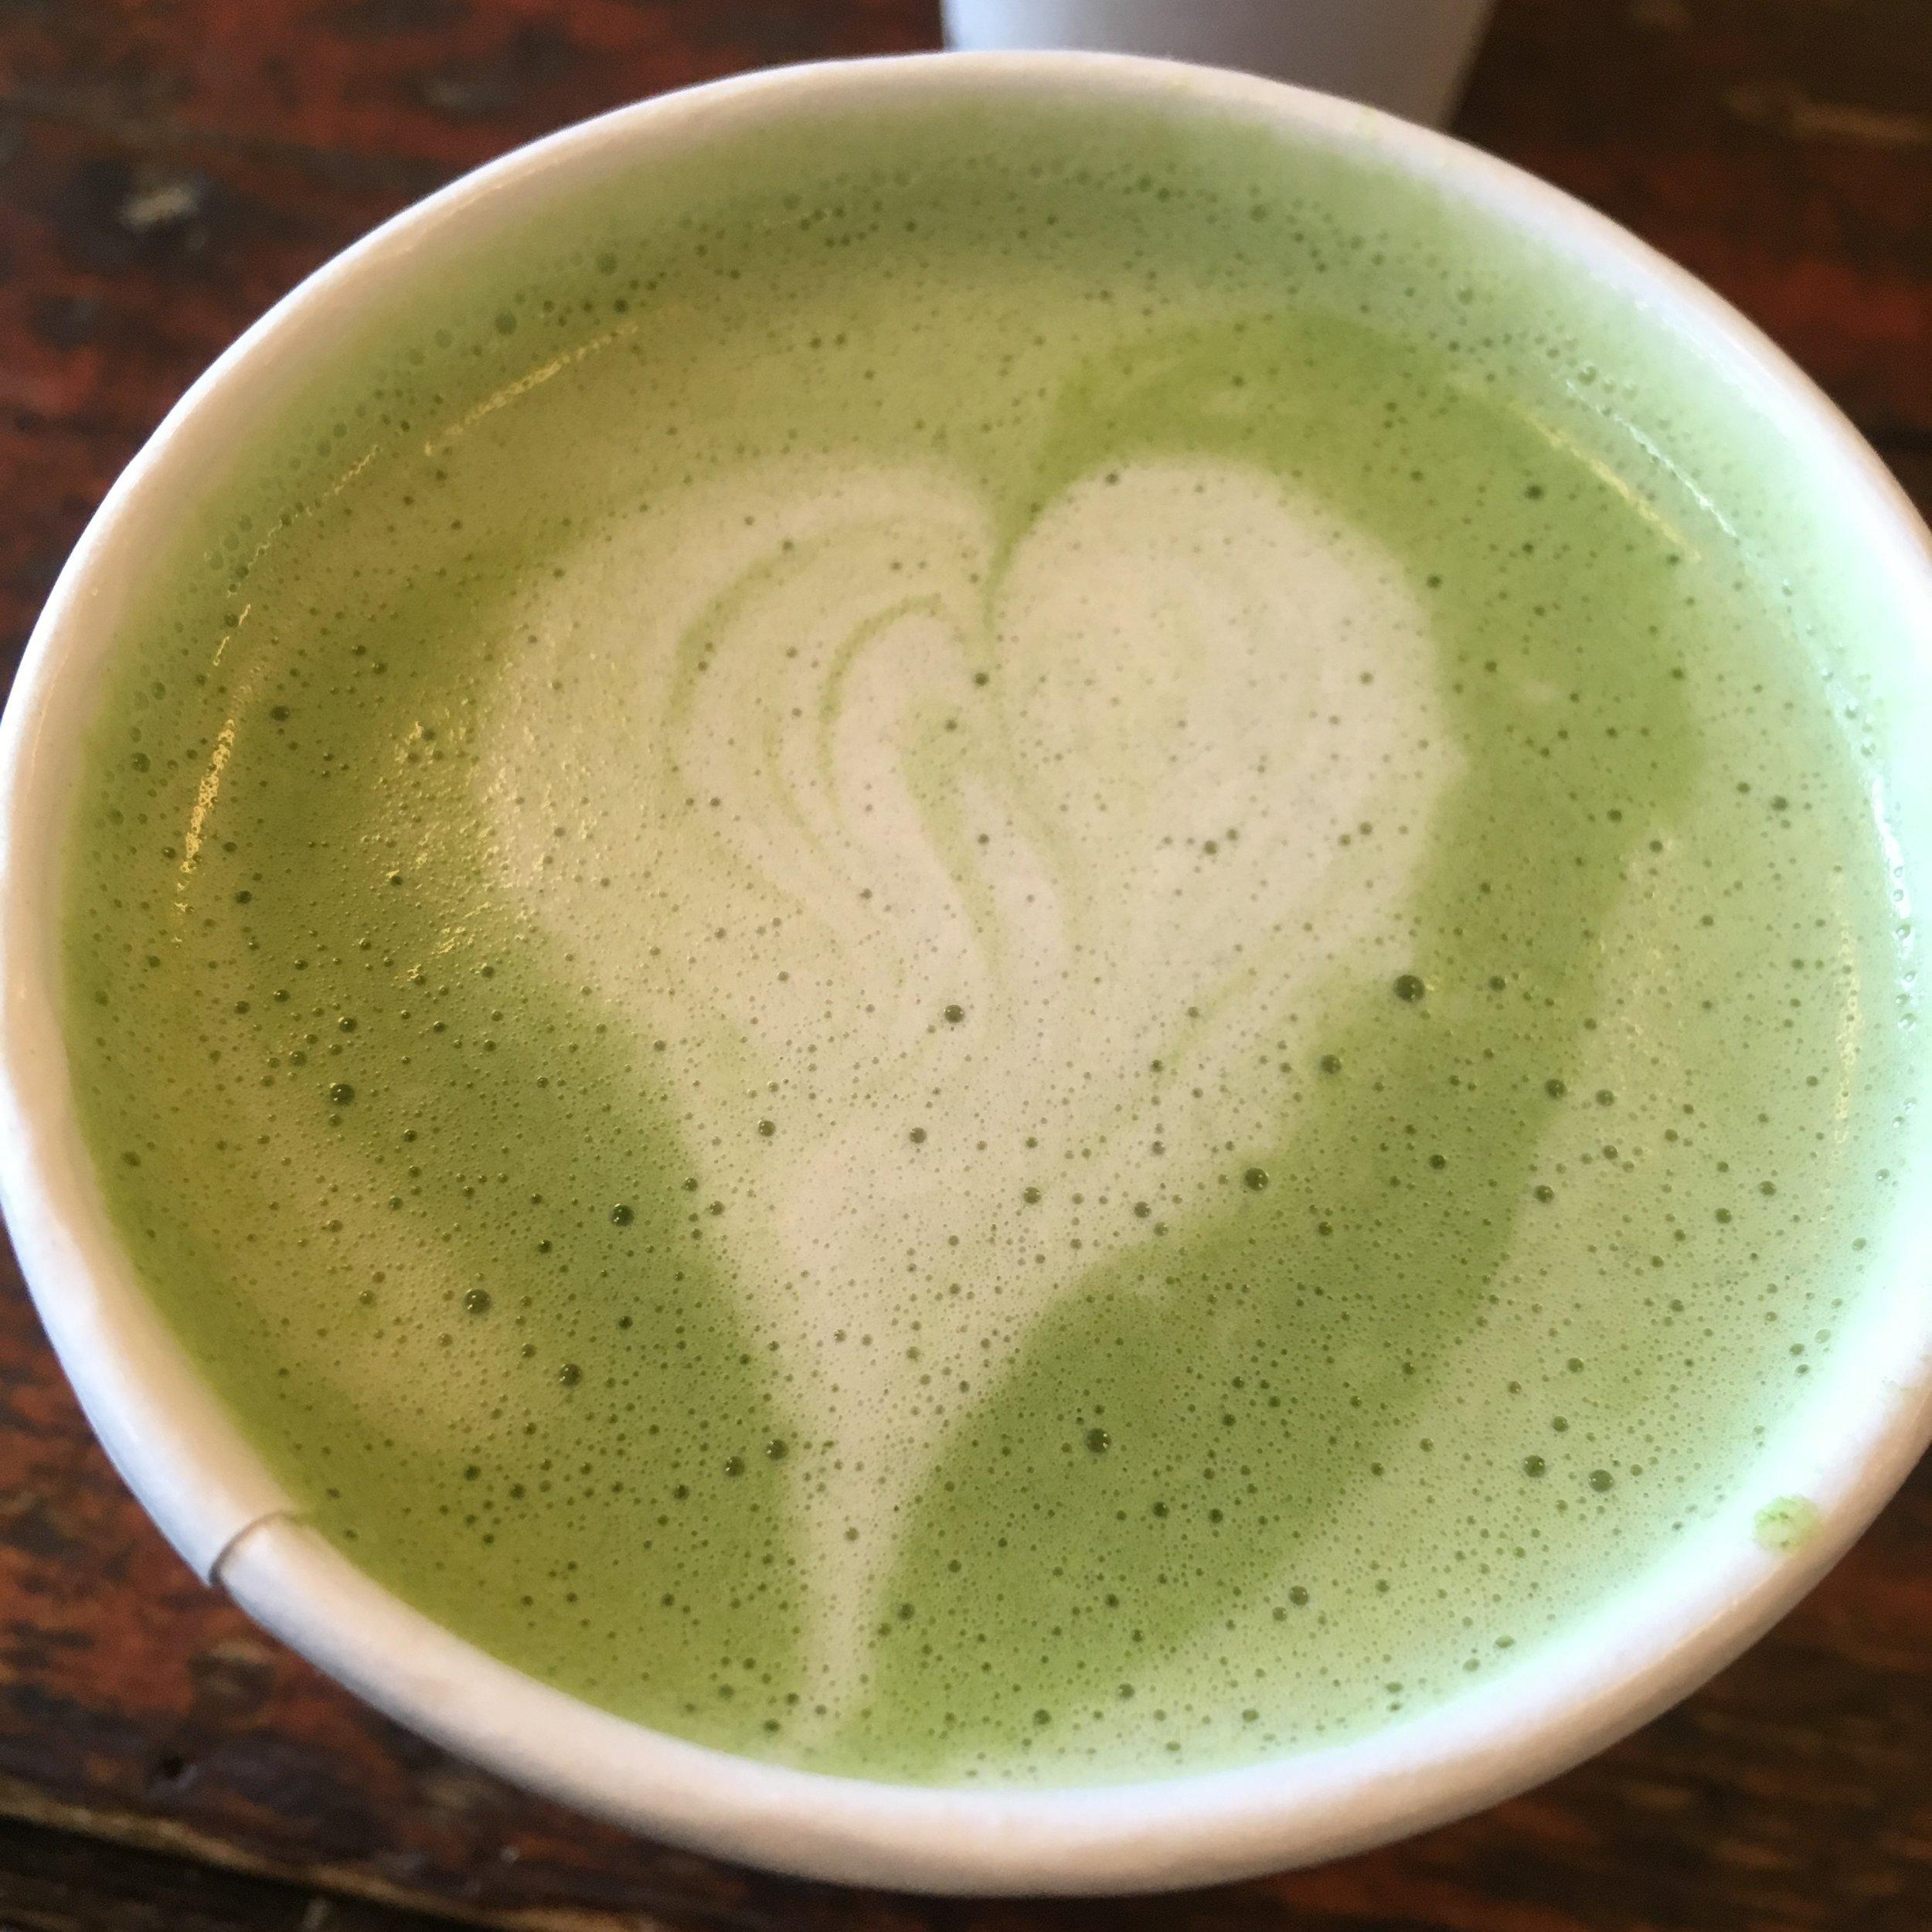 The best green tea (matcha) almond latte at Tatte